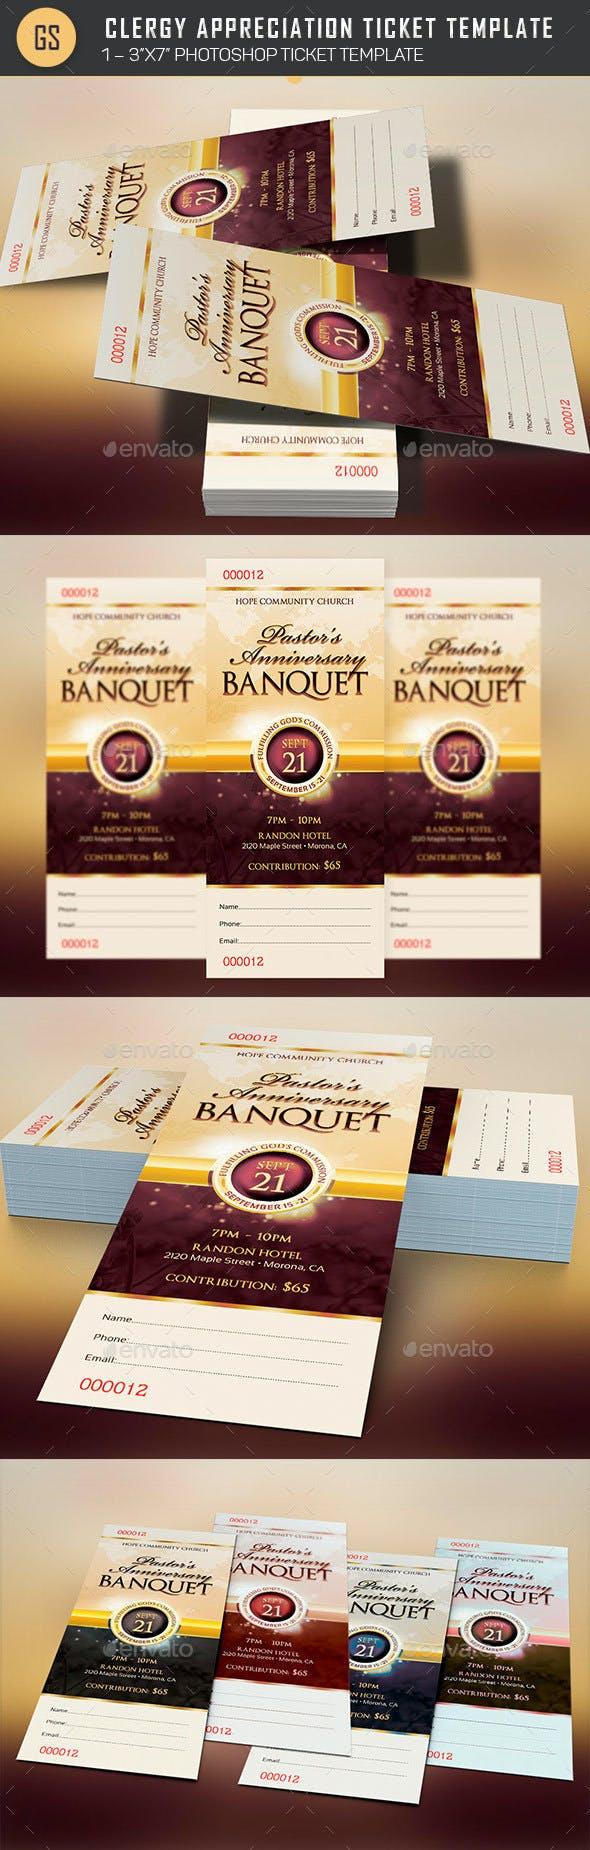 clergy appreciation gala ticket template by godserv2 graphicriver